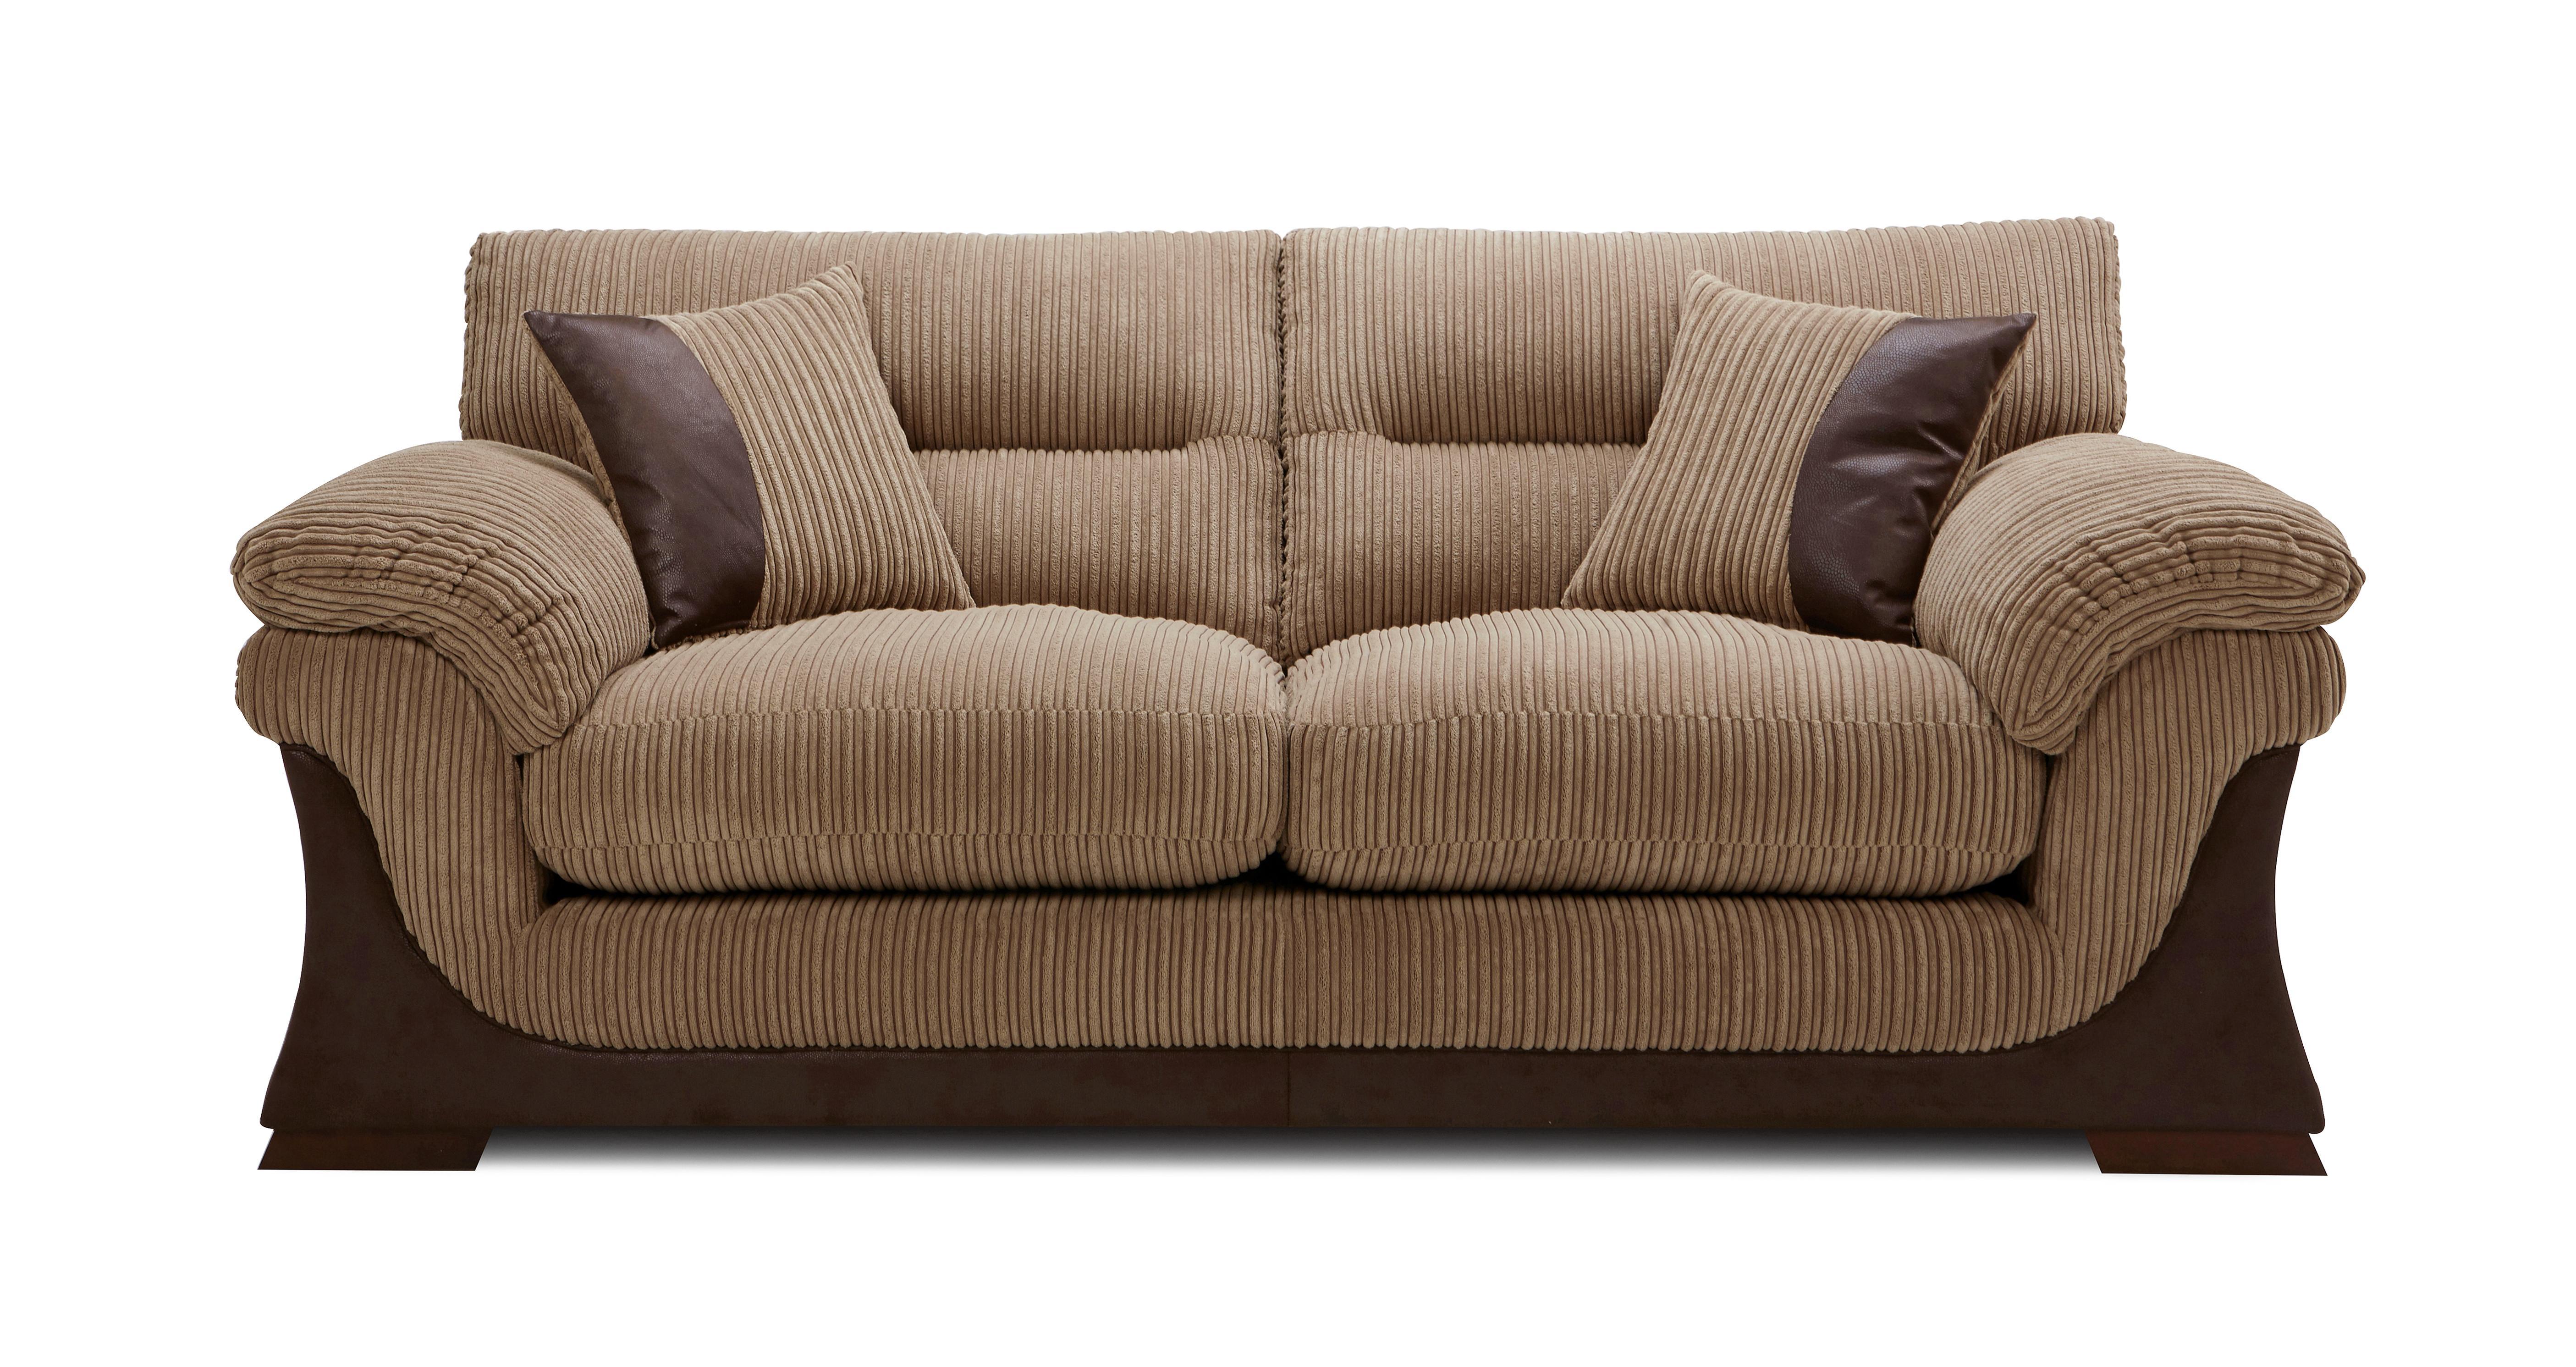 Hanson 3 Seater Sofa Samson | DFS